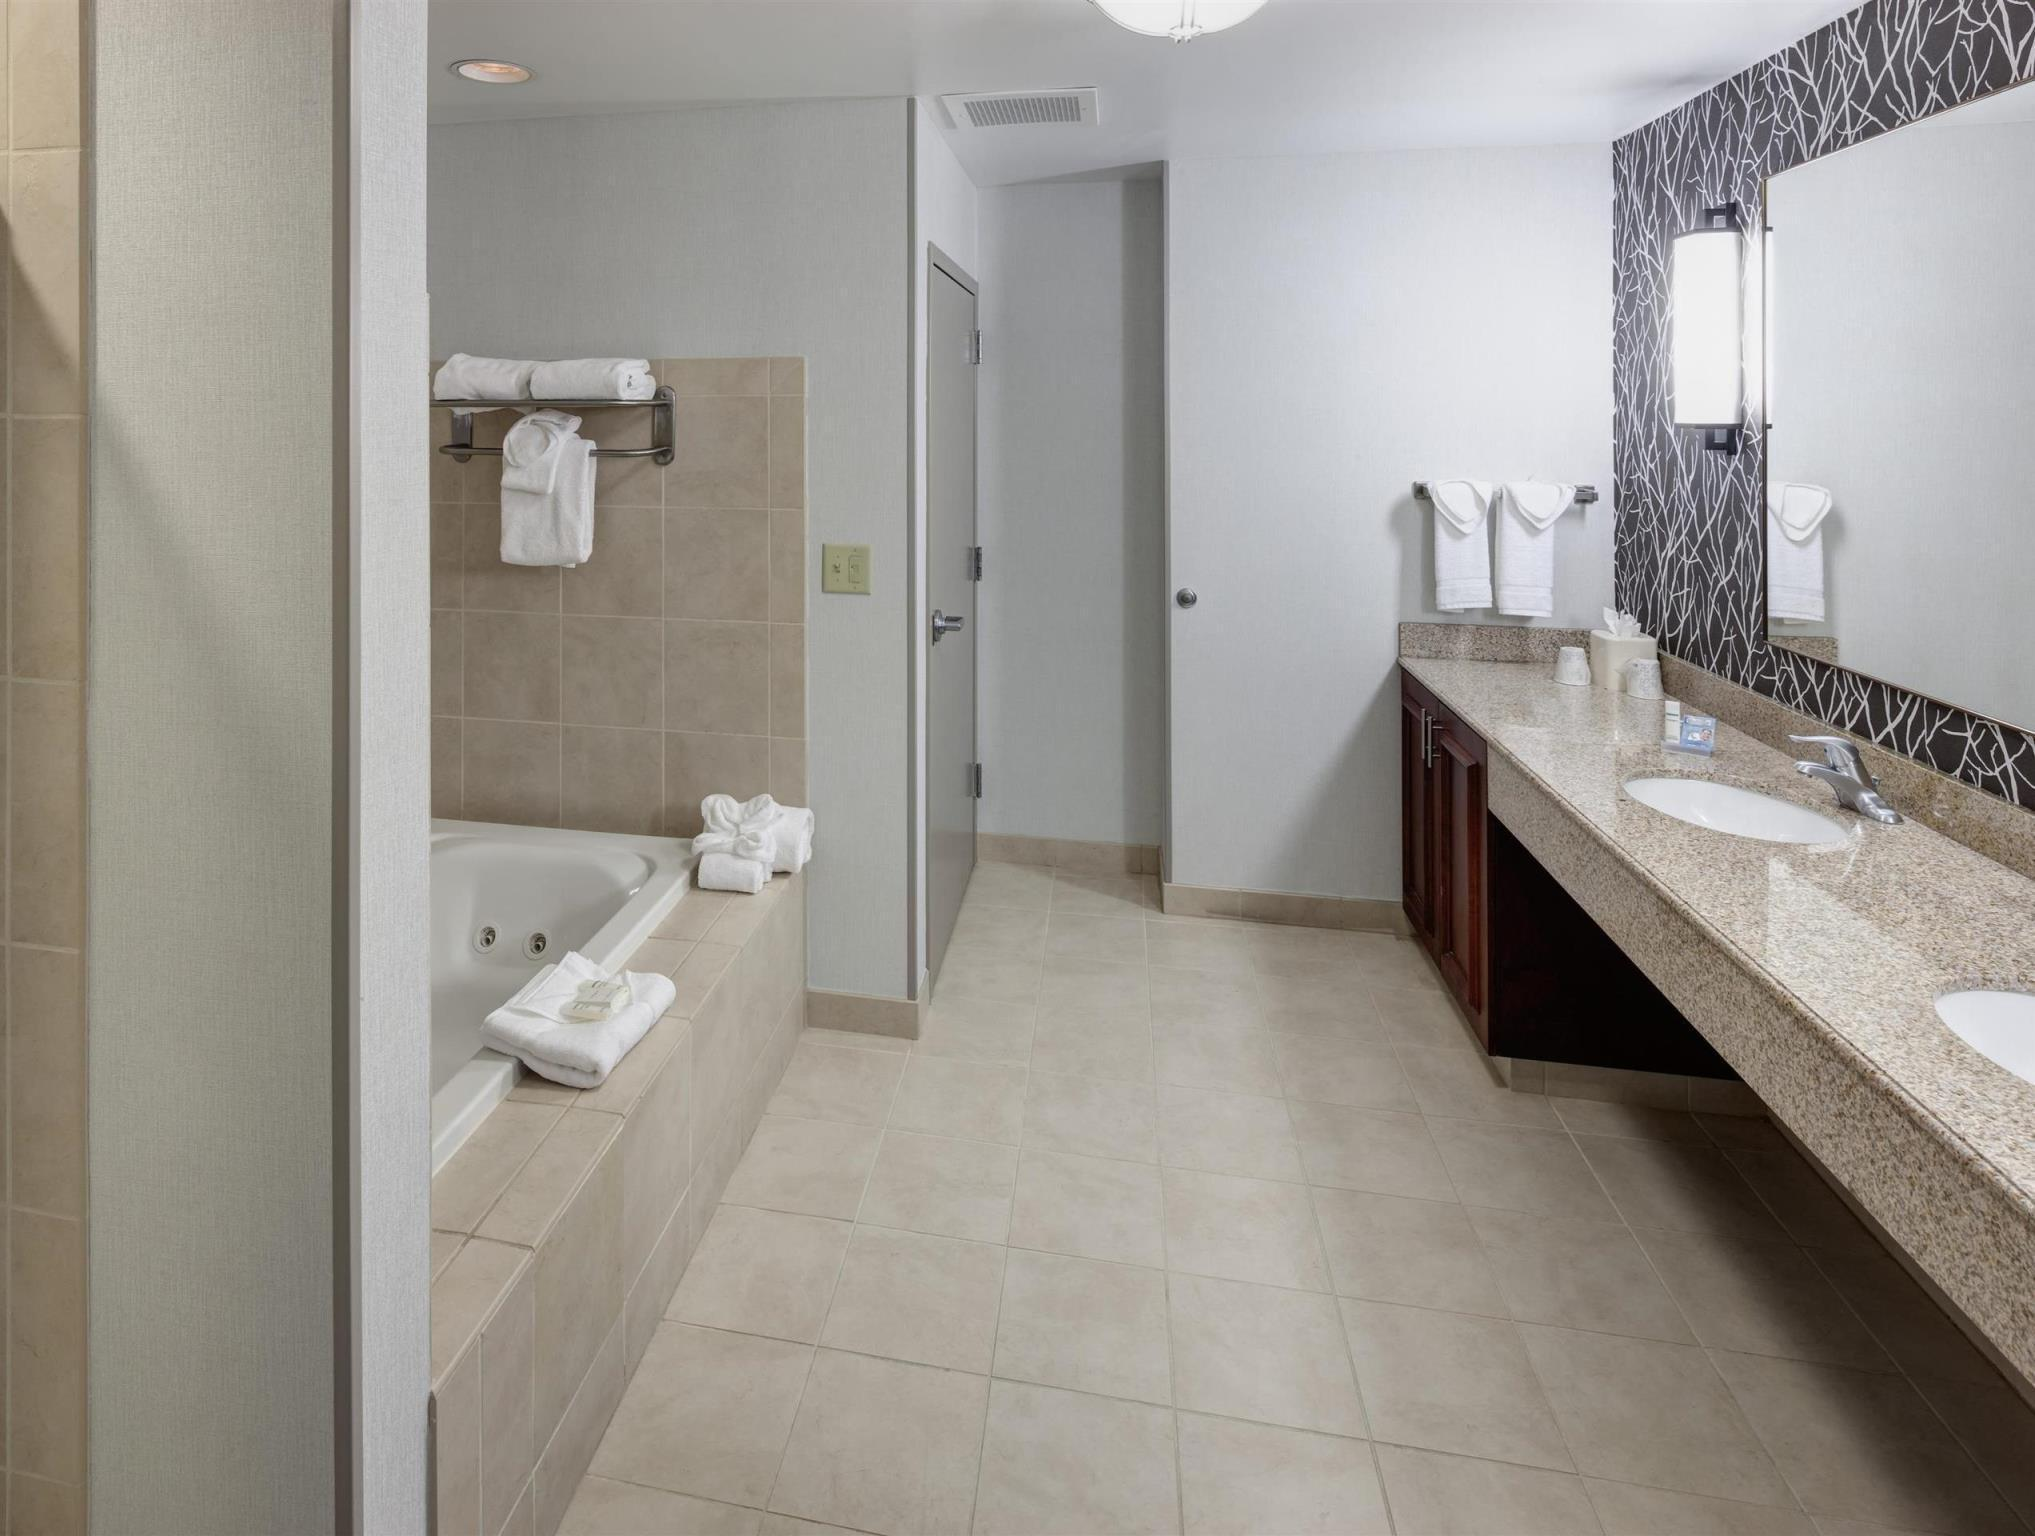 1 King Bed With Whirlpool   Bathroom Hilton Garden Inn Nashville Vanderbilt